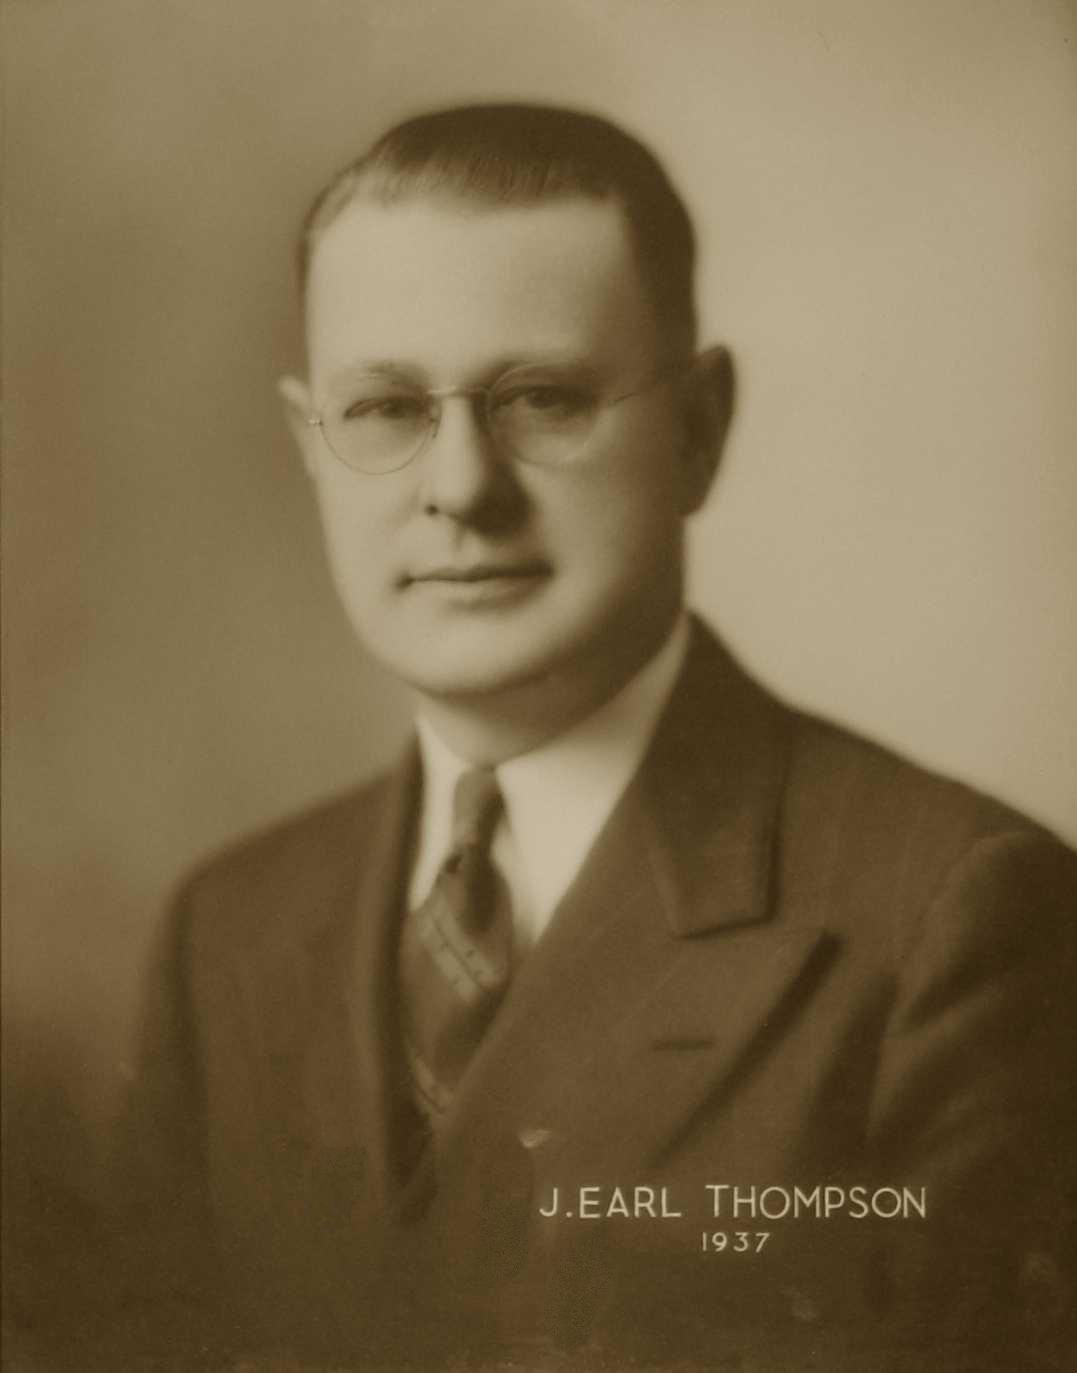 J. Earl Thompson, 1937